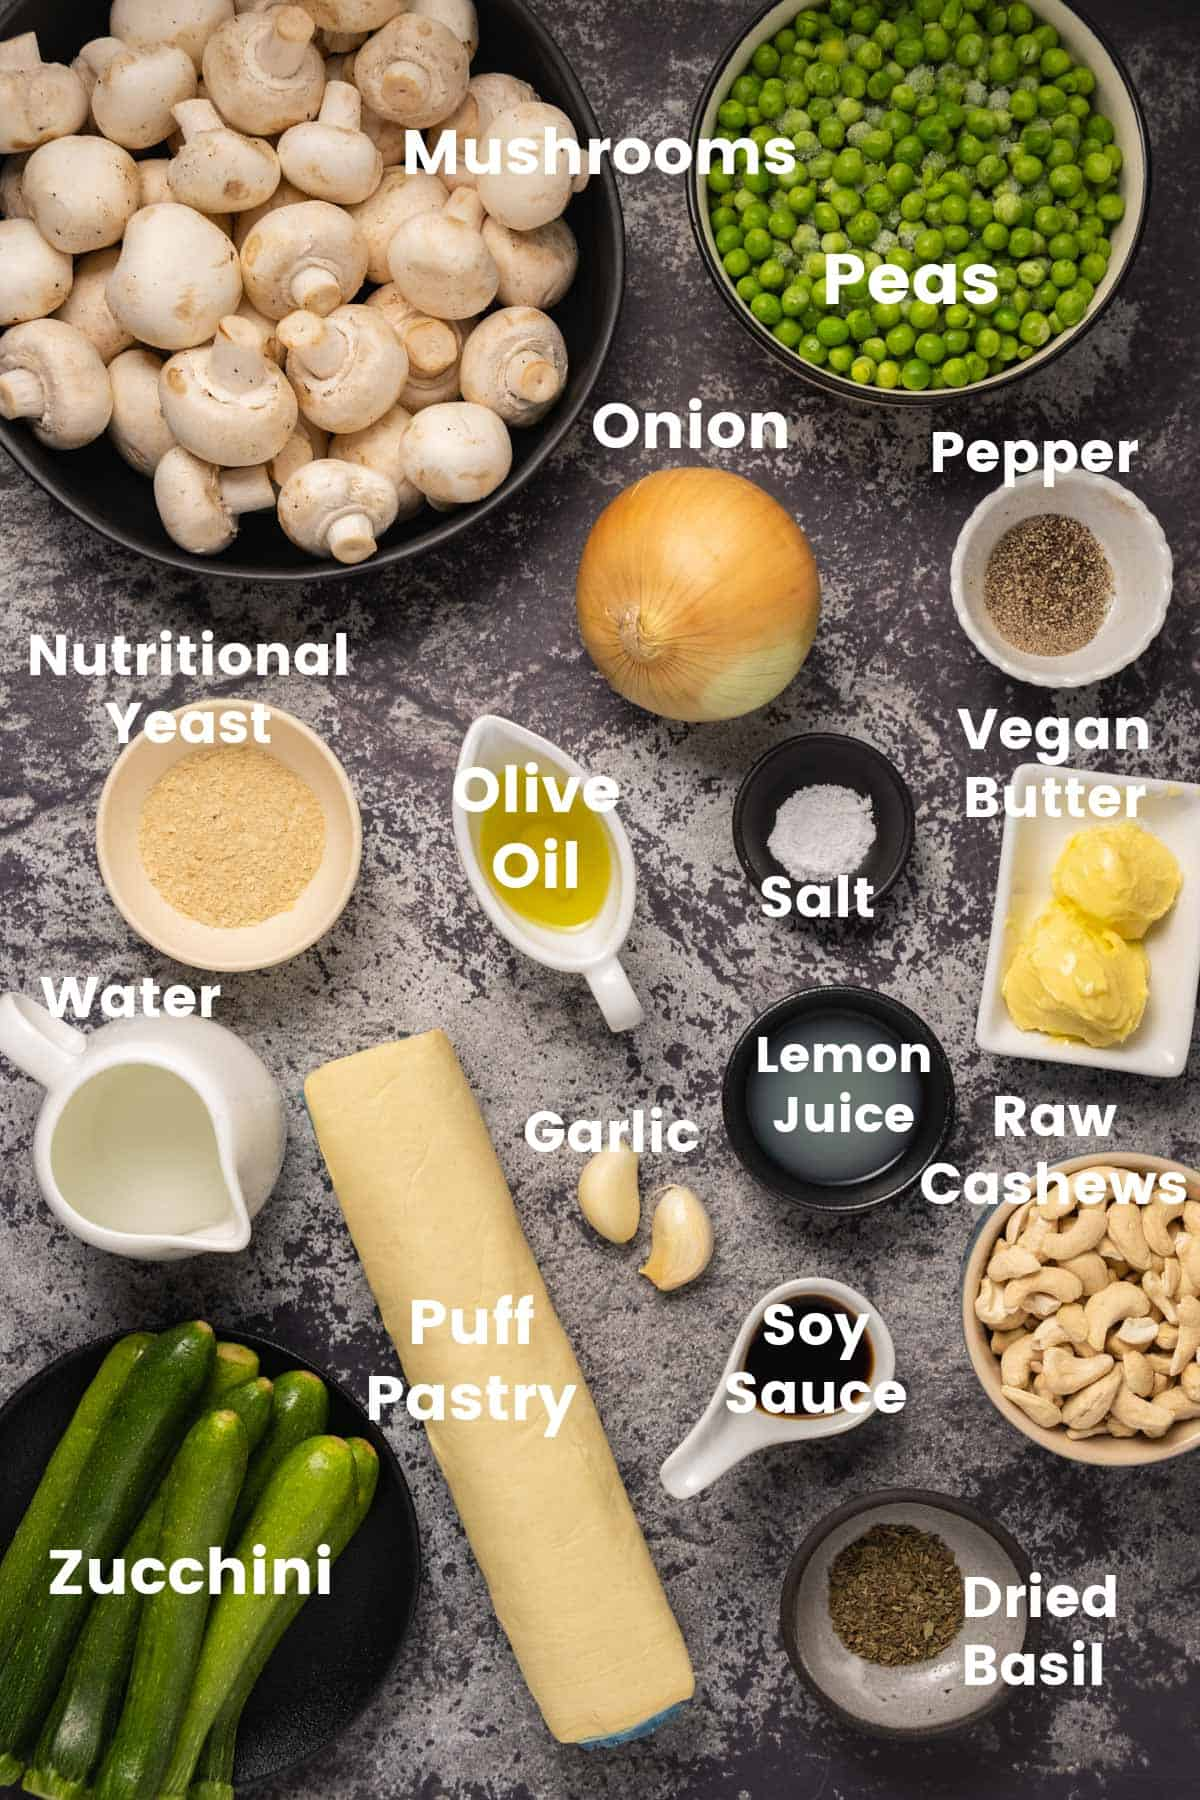 Photo of ingredients needed to make a vegan pot pie.